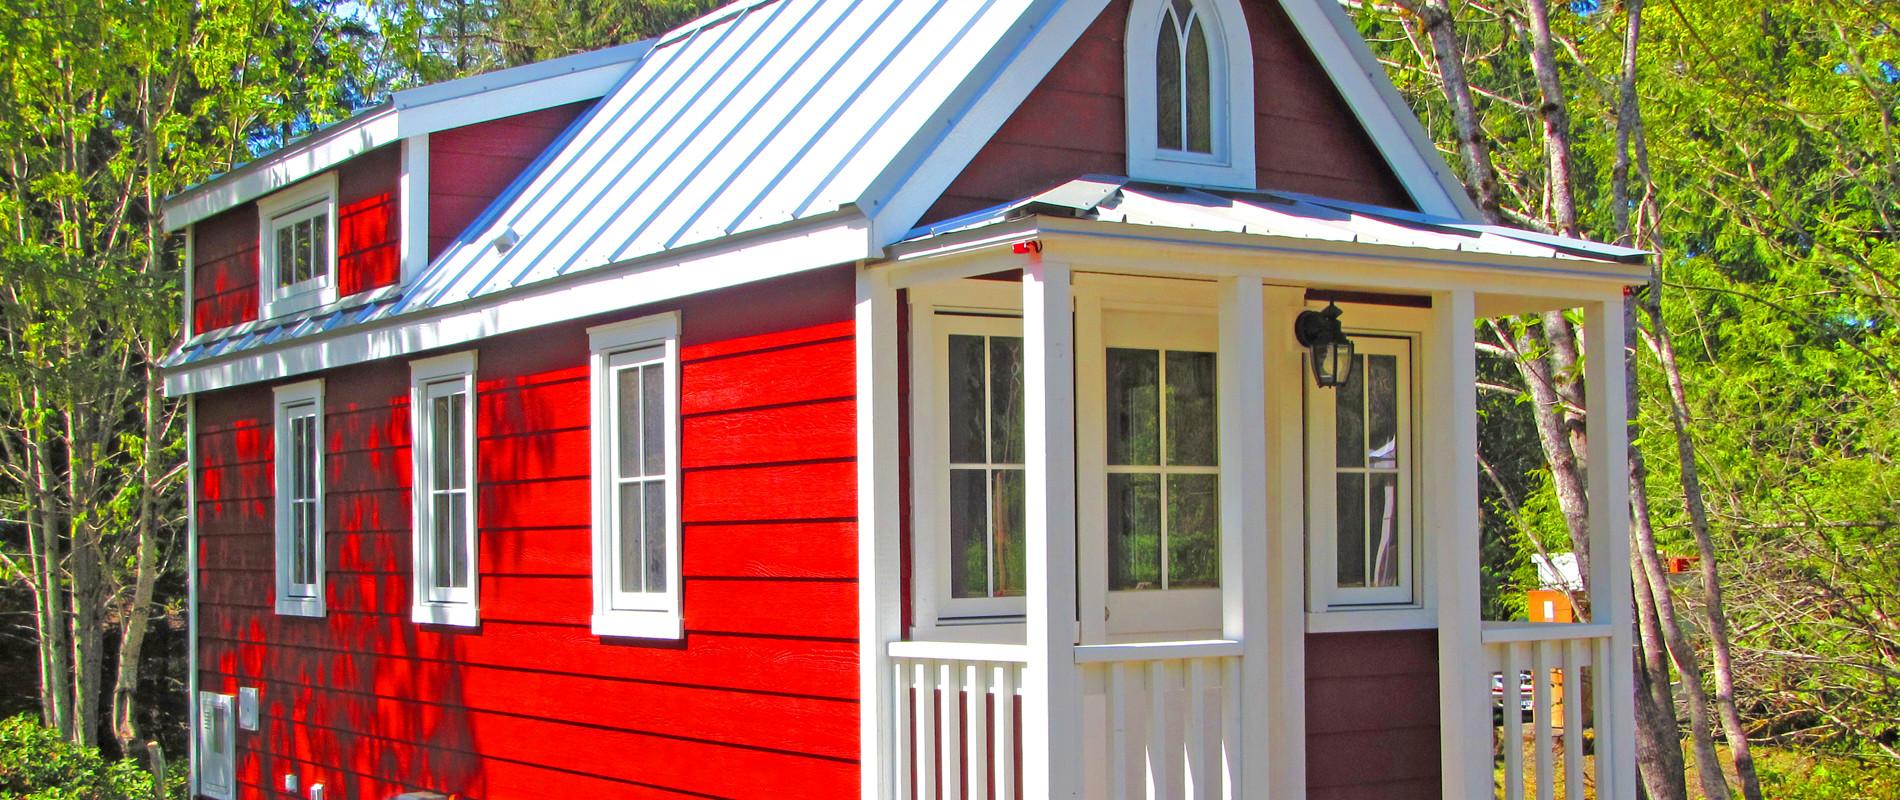 Fullsize Of Tiny Homes For Sale Oregon